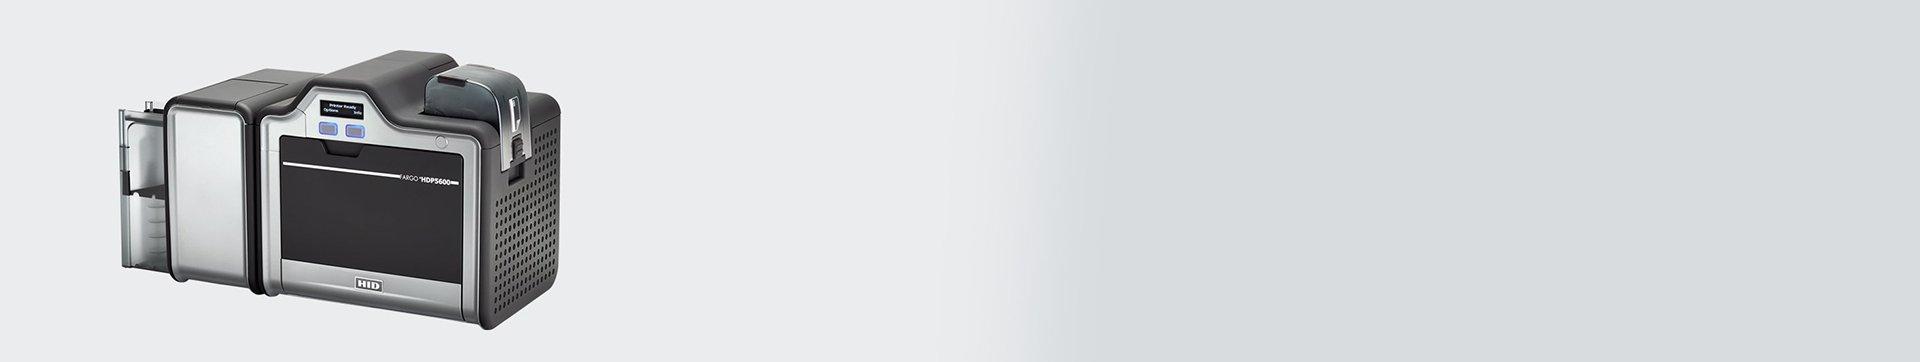 ID Stampaci - Fargo HDP5600